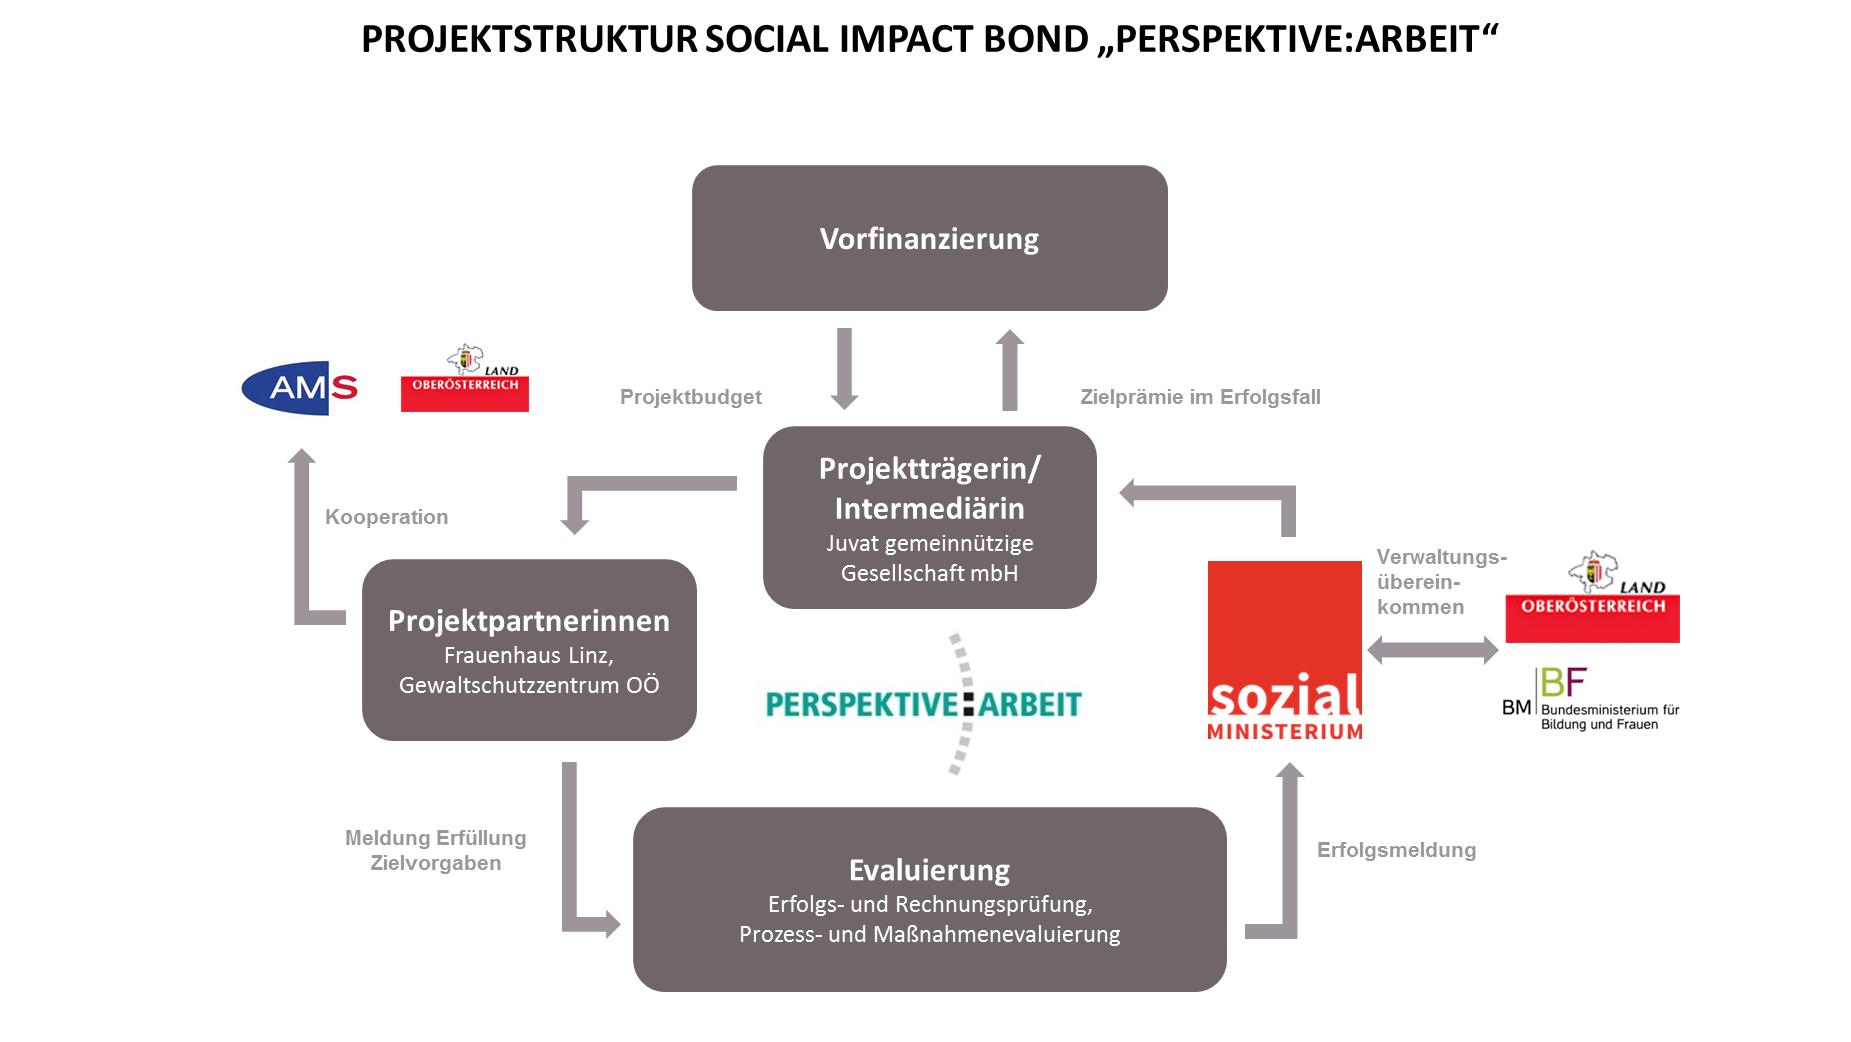 projektstruktursocialimpactbond